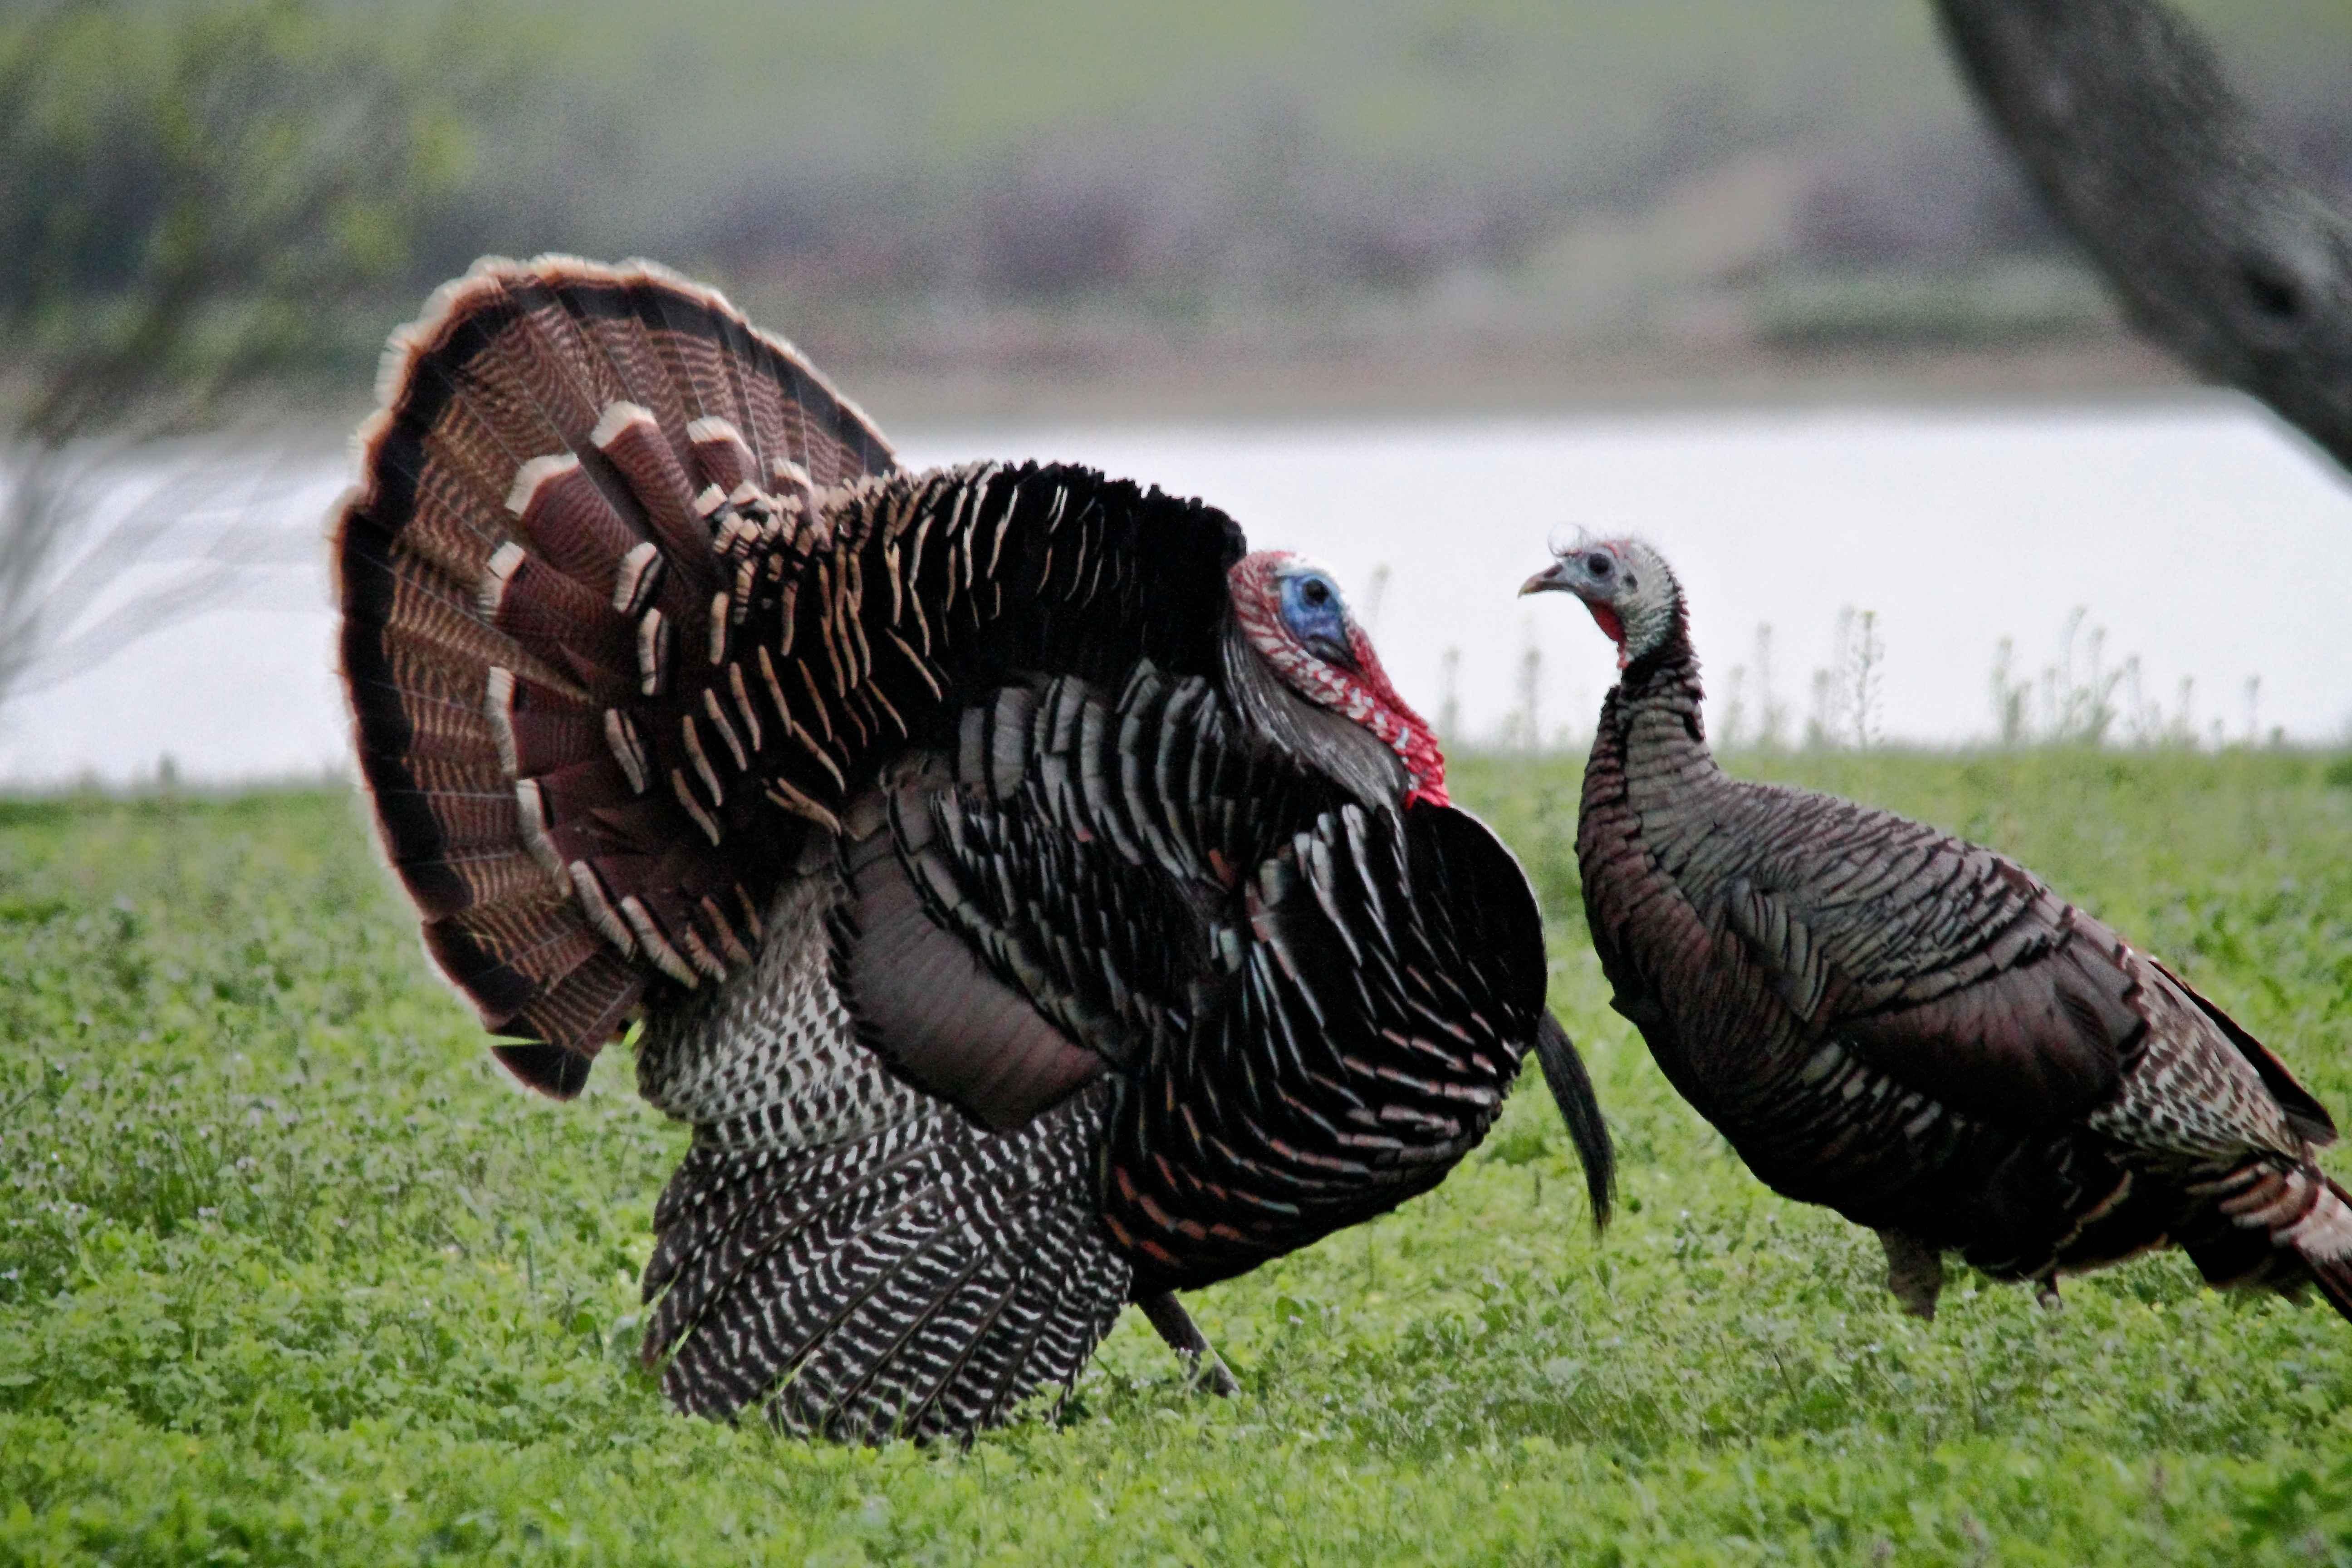 Turkey birds free images, public domain images